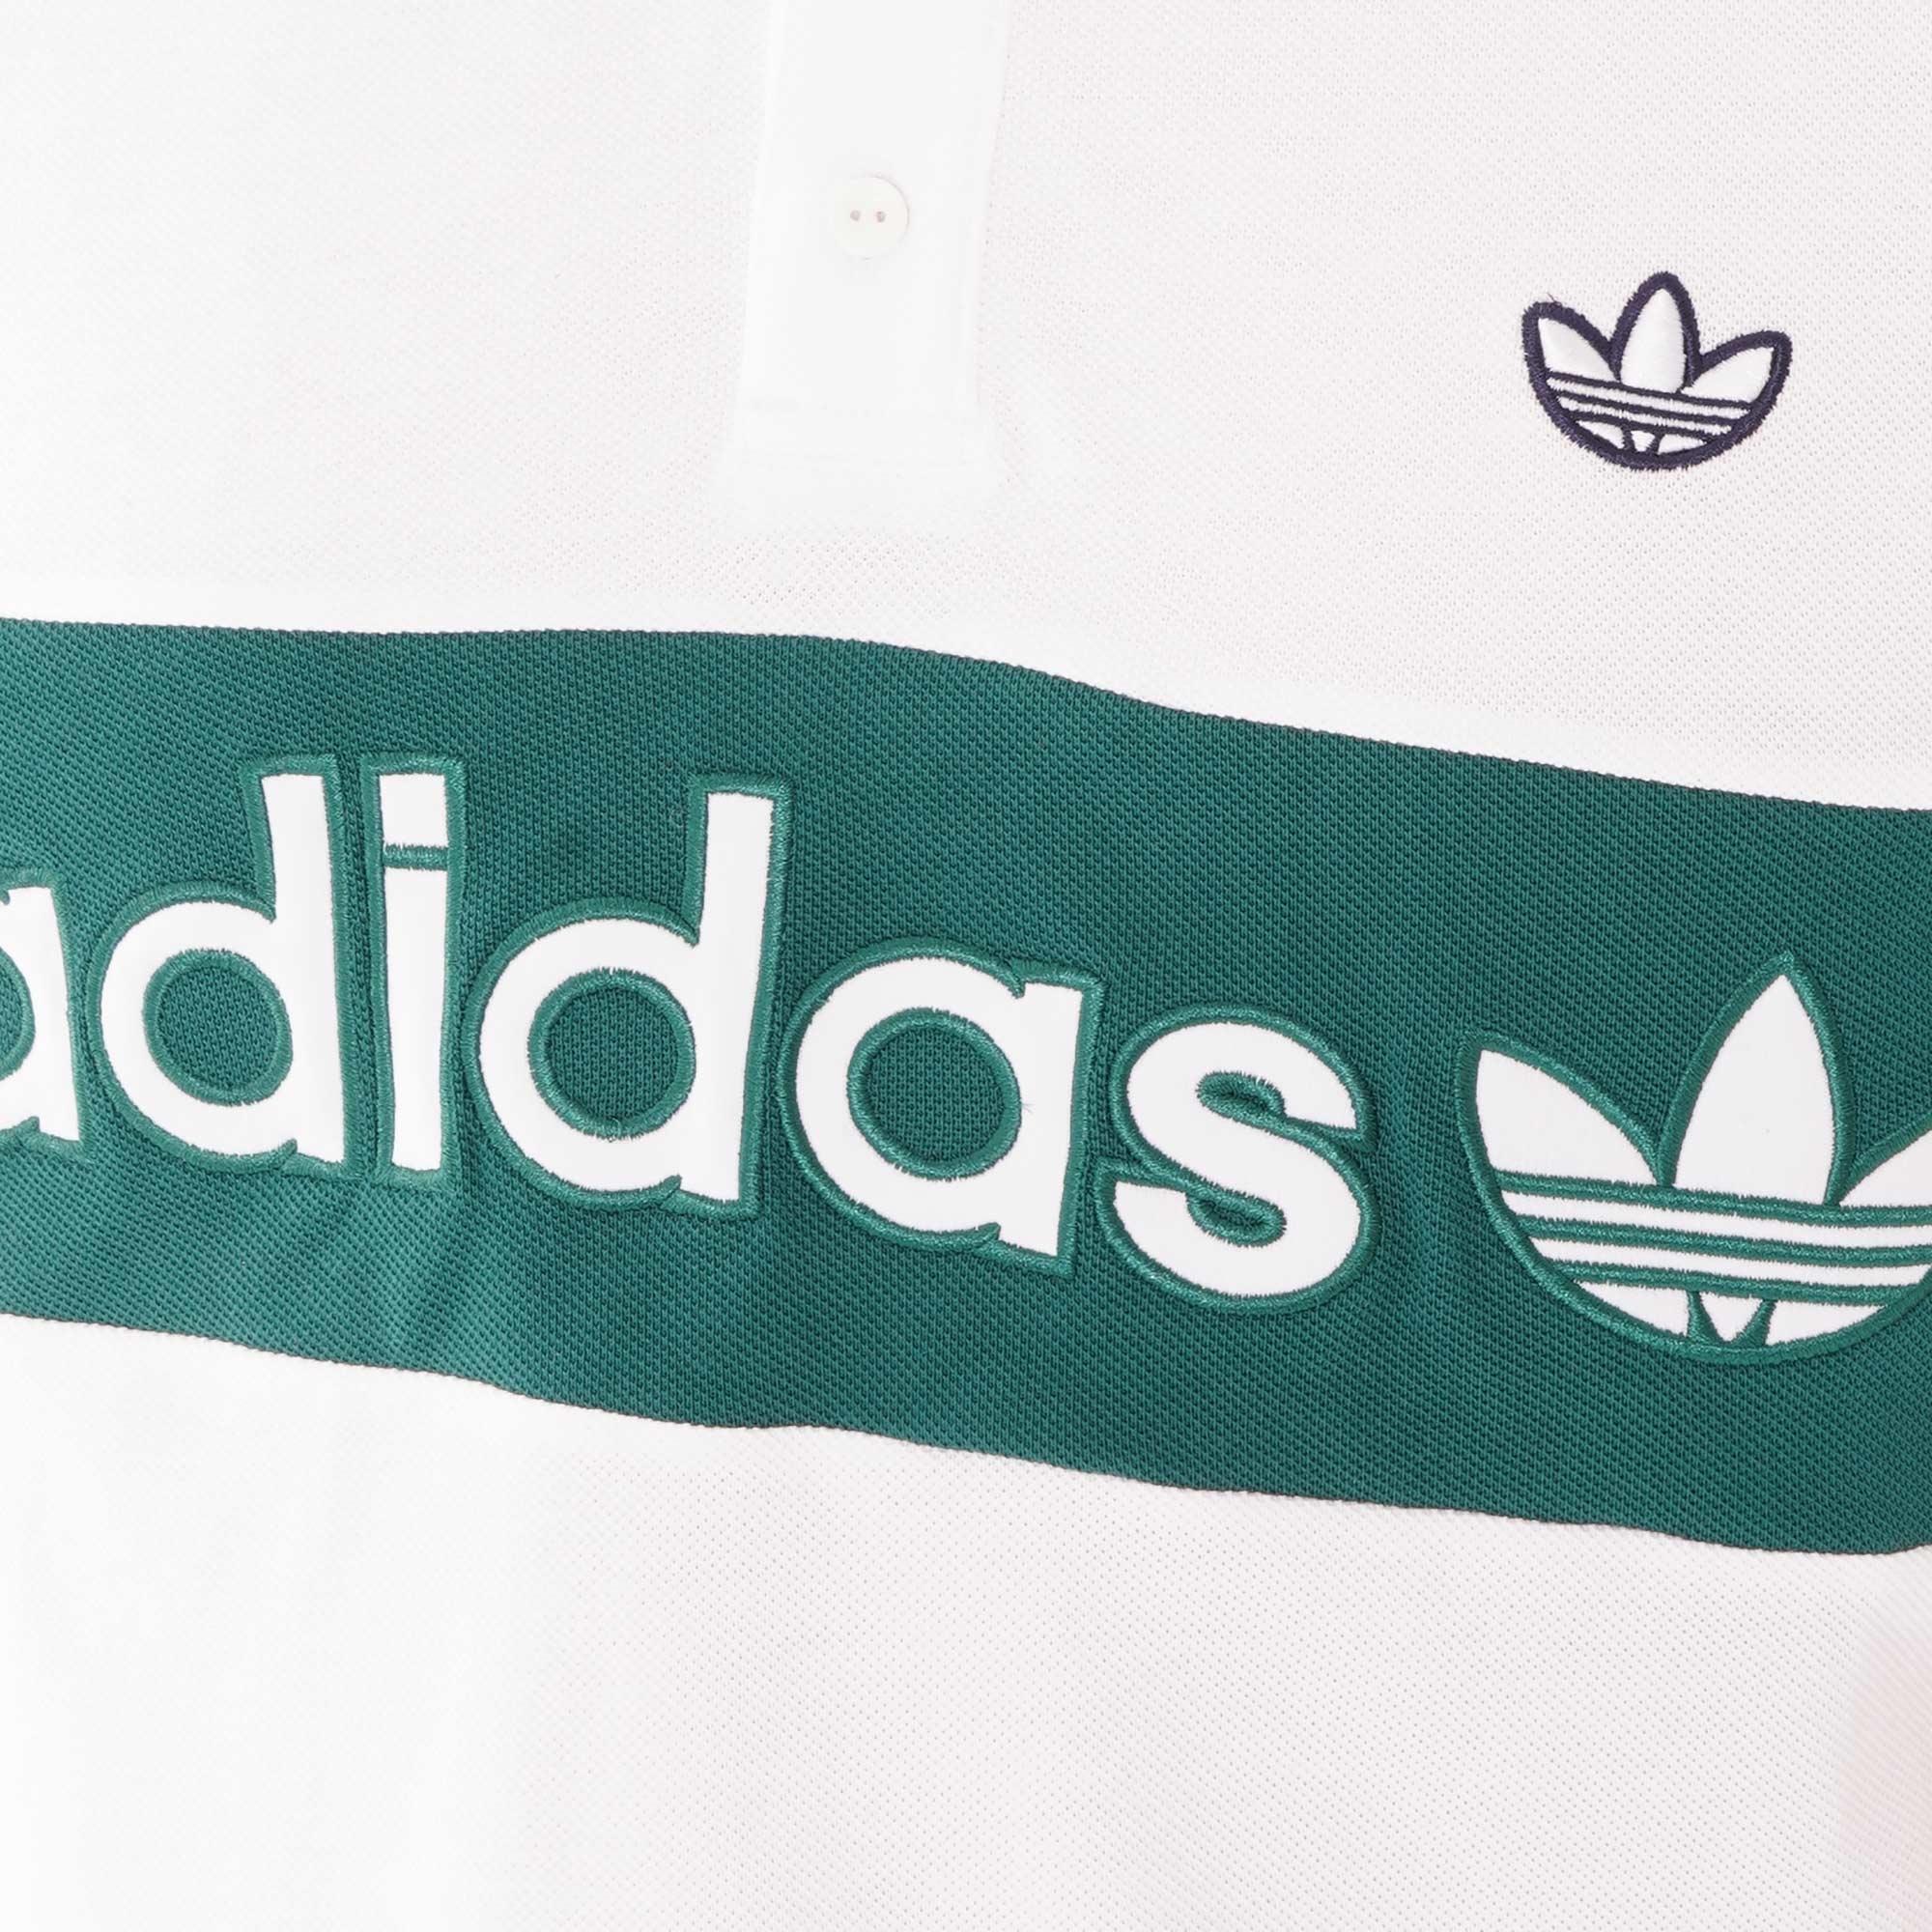 adidas Originals Samstag Colorblock Poloshirt White and Green